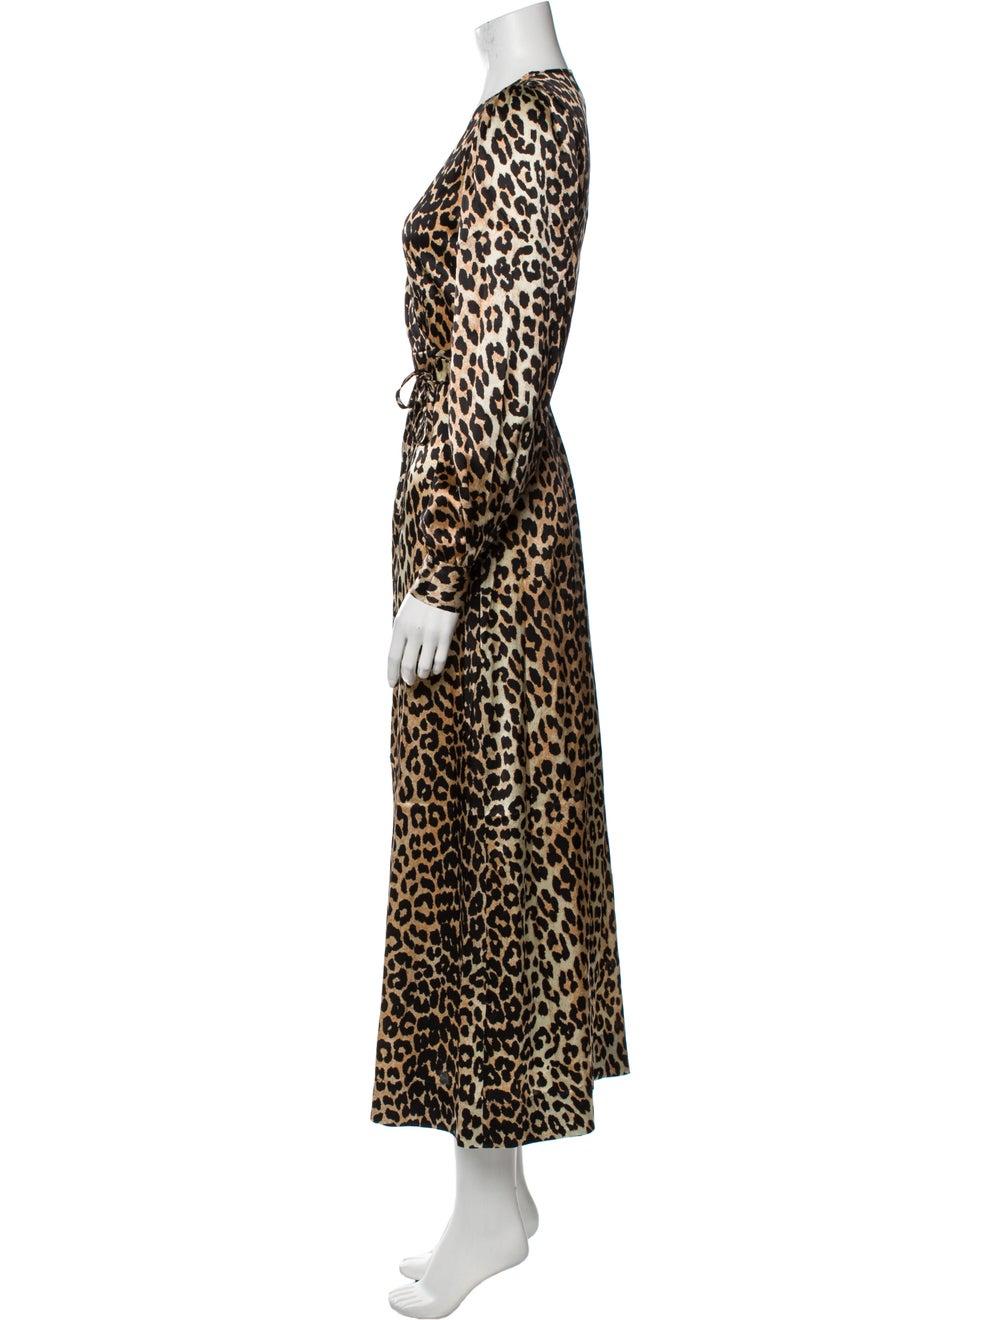 Ganni Silk Long Dress - image 2